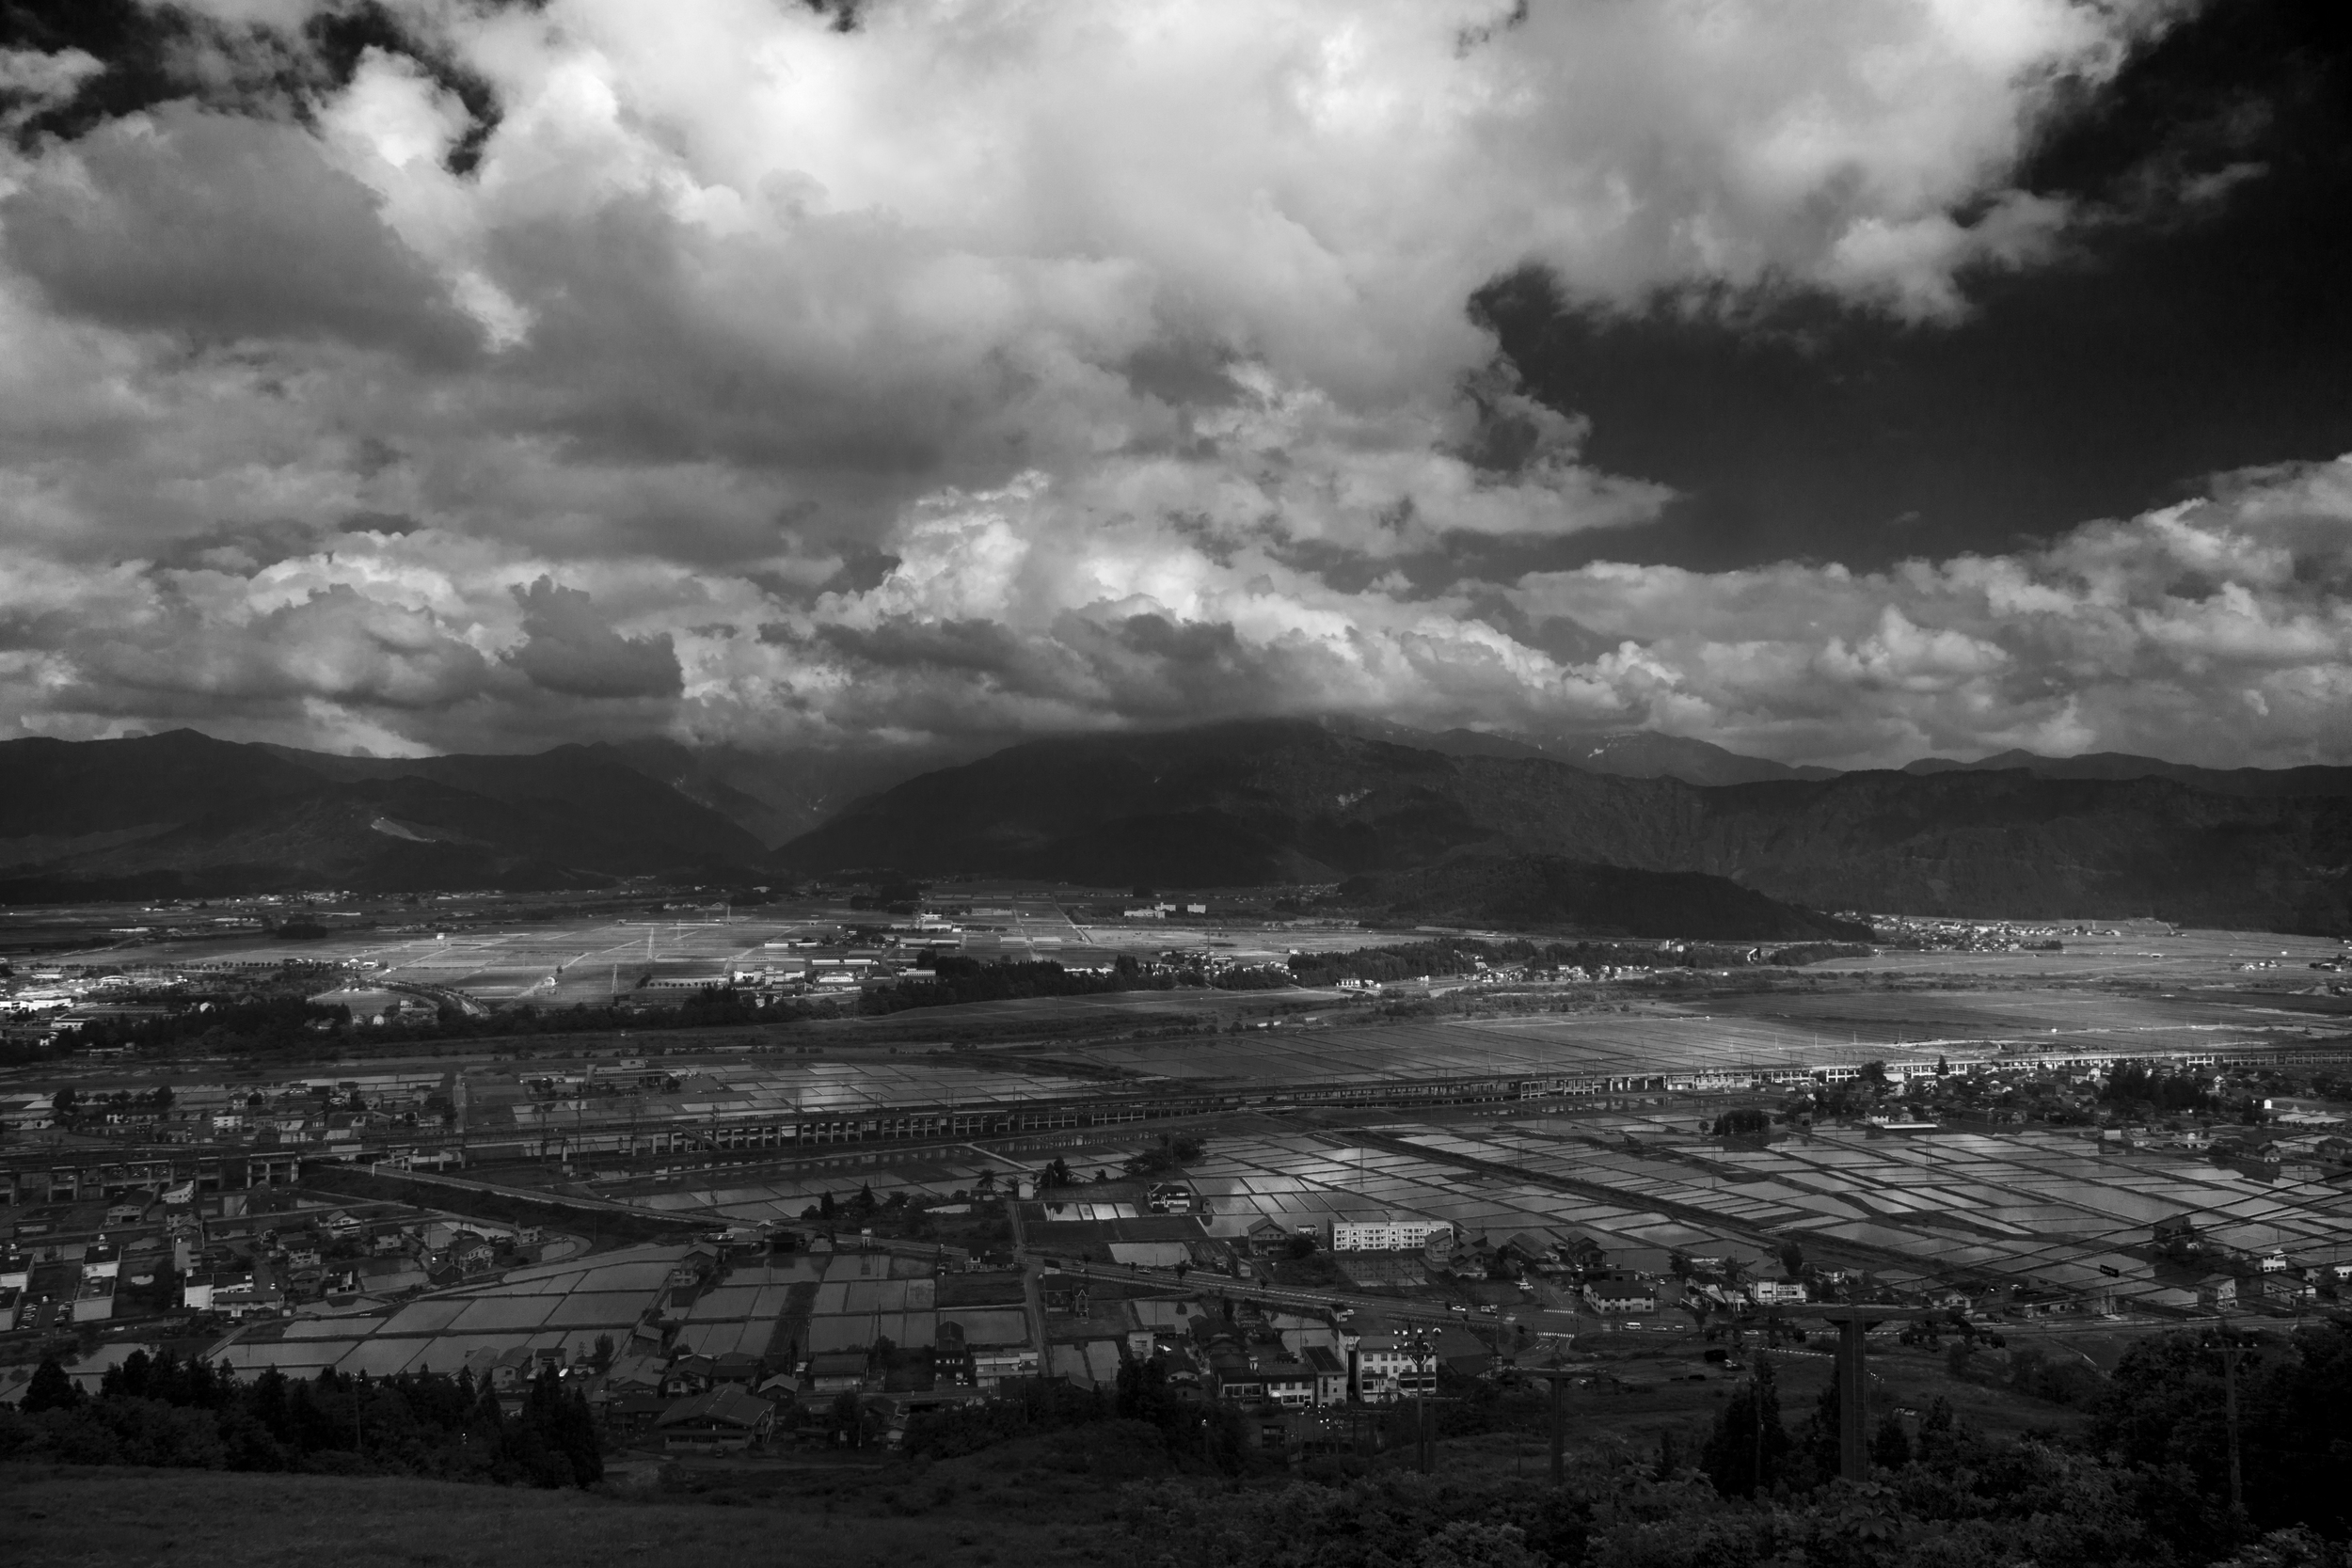 Urasa From Above (Urasa, Niigata)